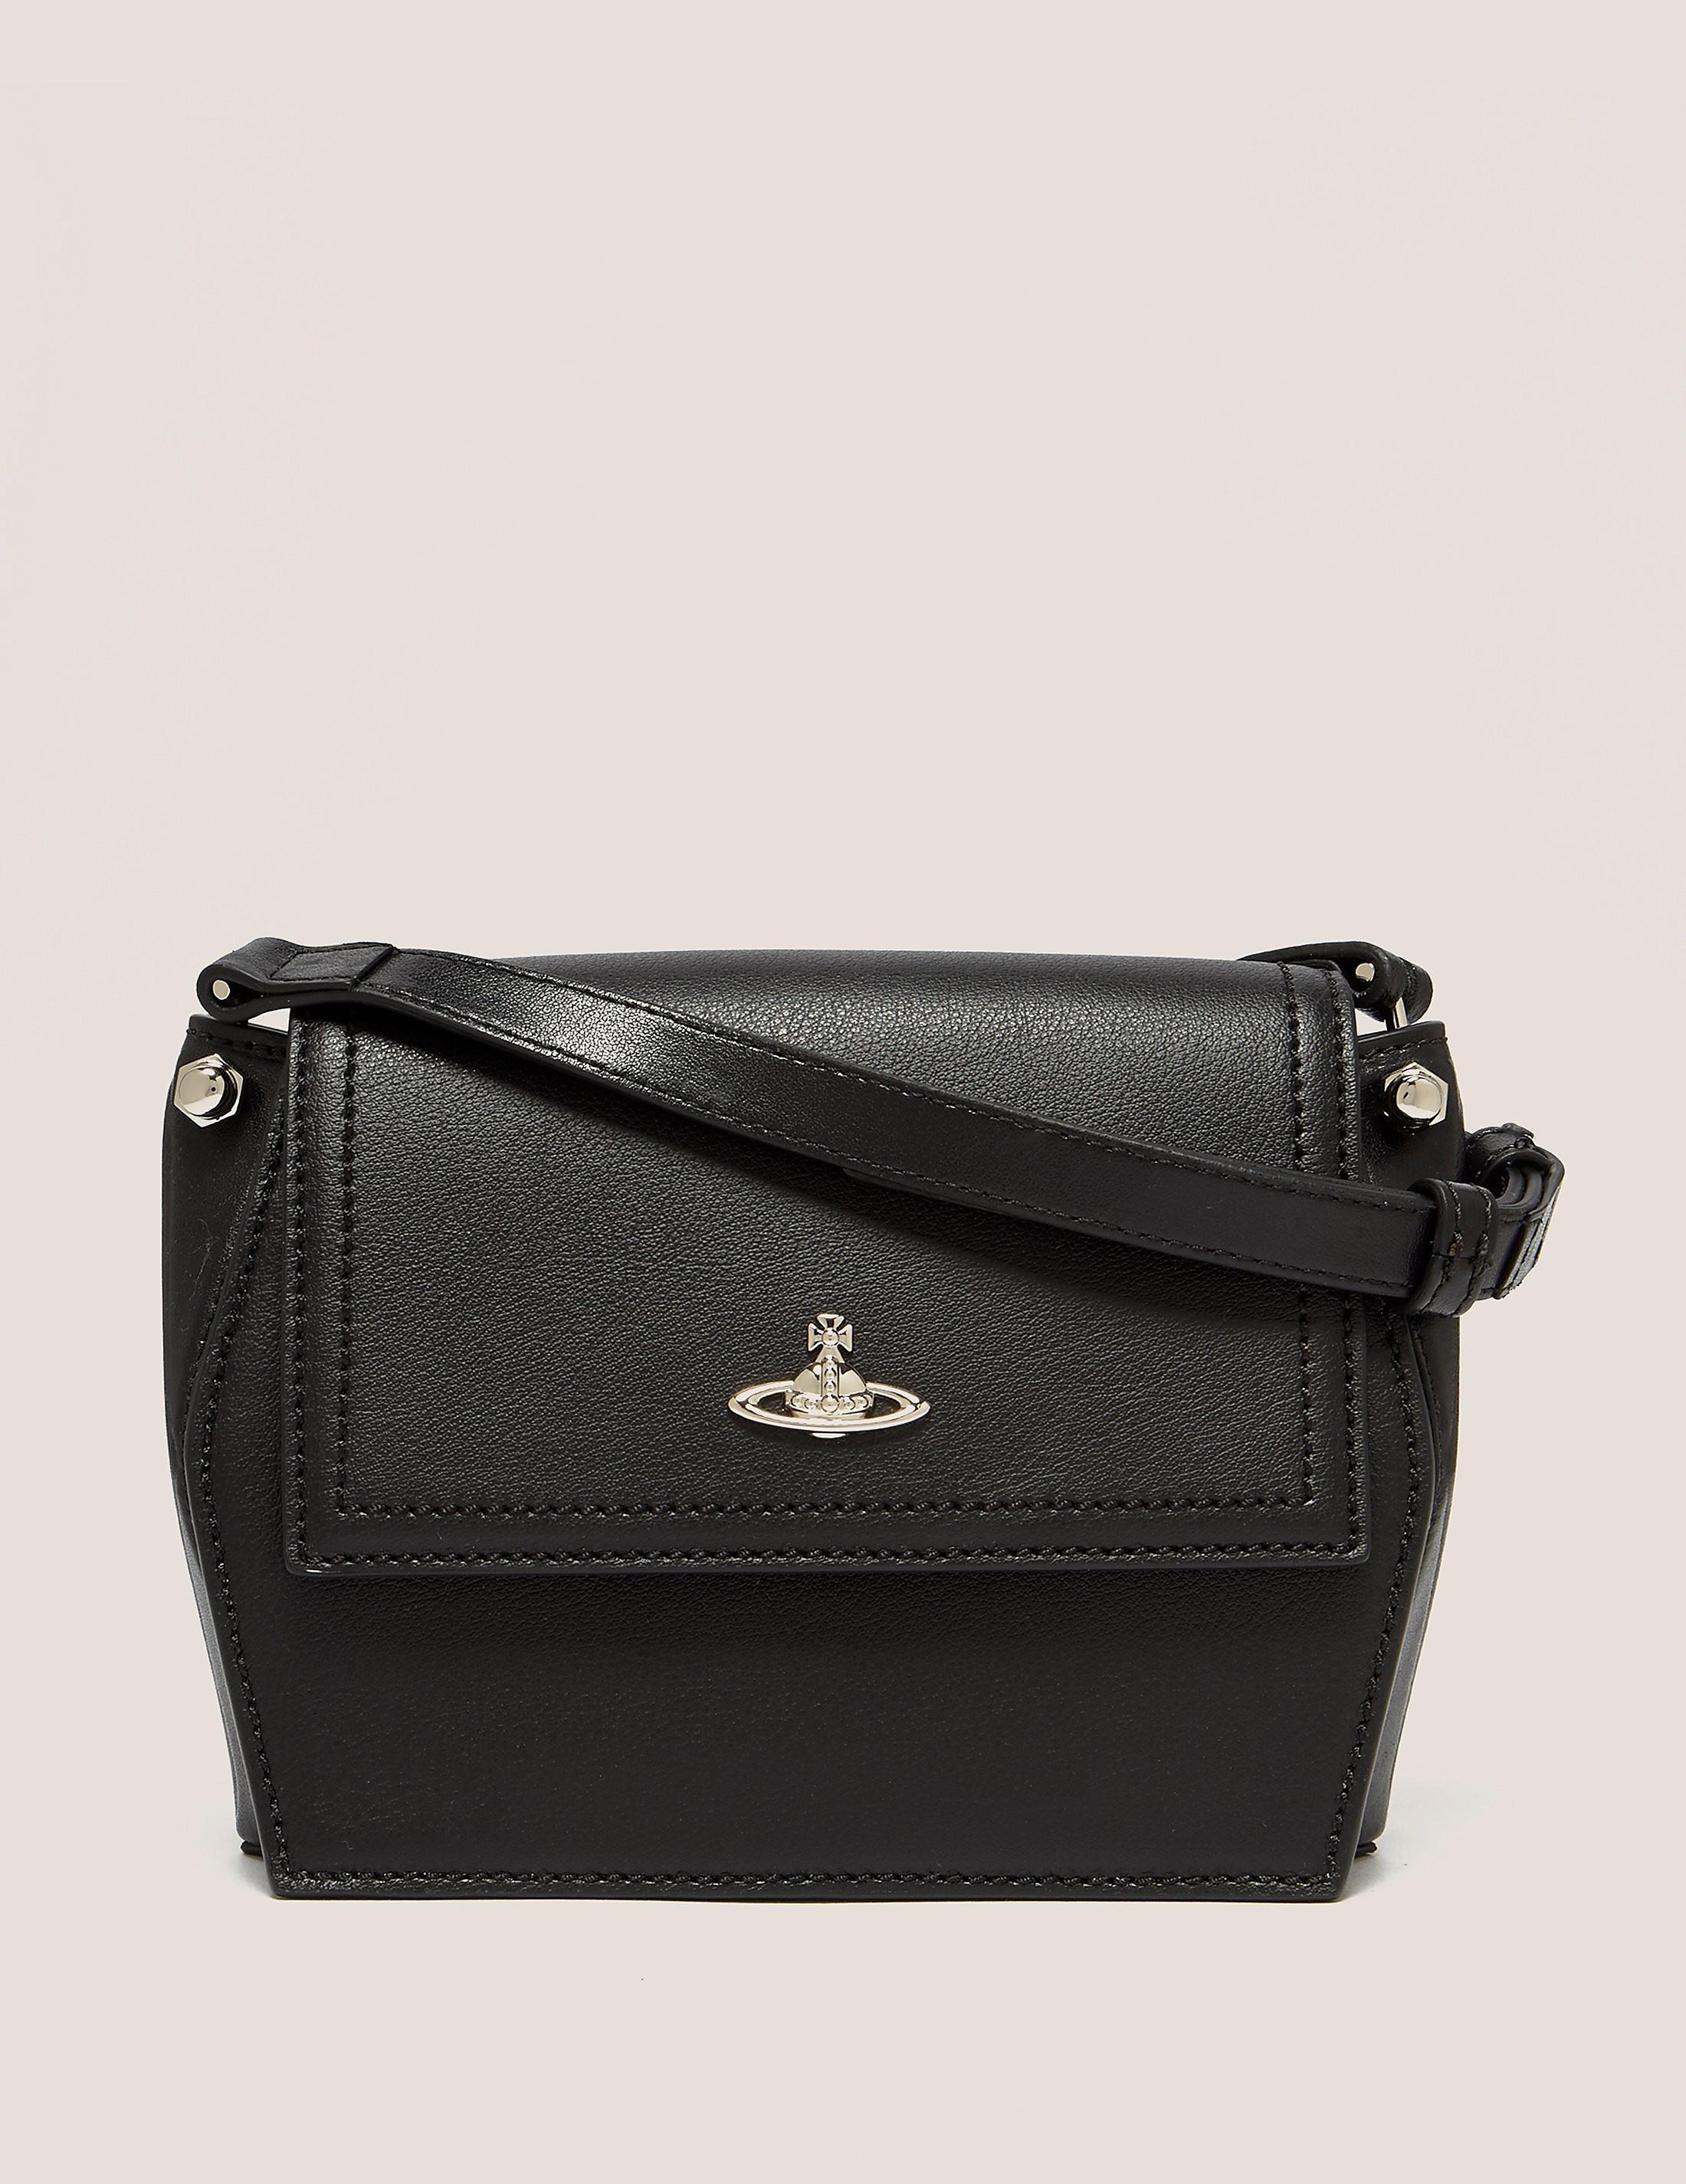 Vivienne Westwood Cambridge Crossbody Bag